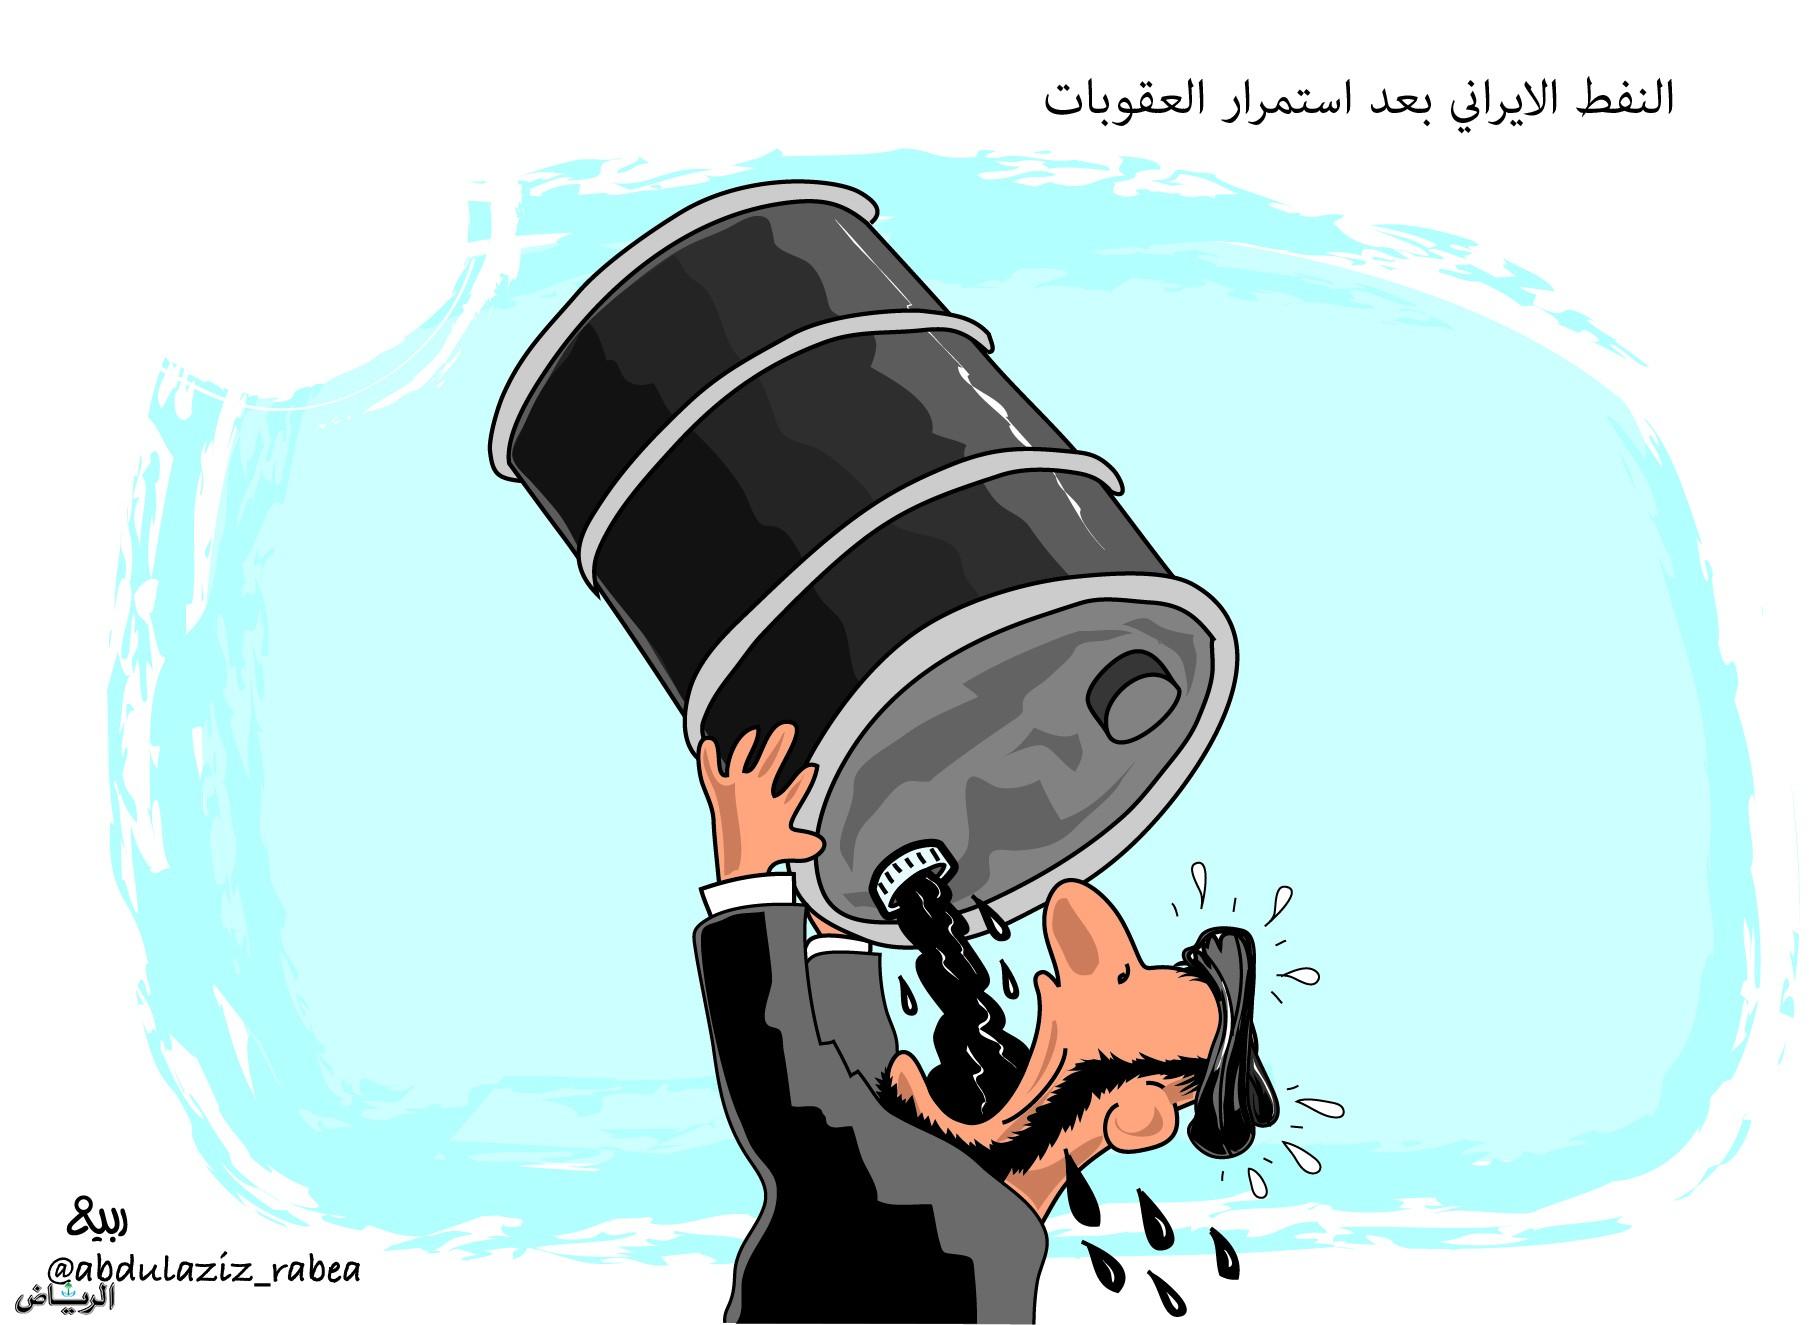 إيران تتجرع نفطها بعد استمرار العقوبات